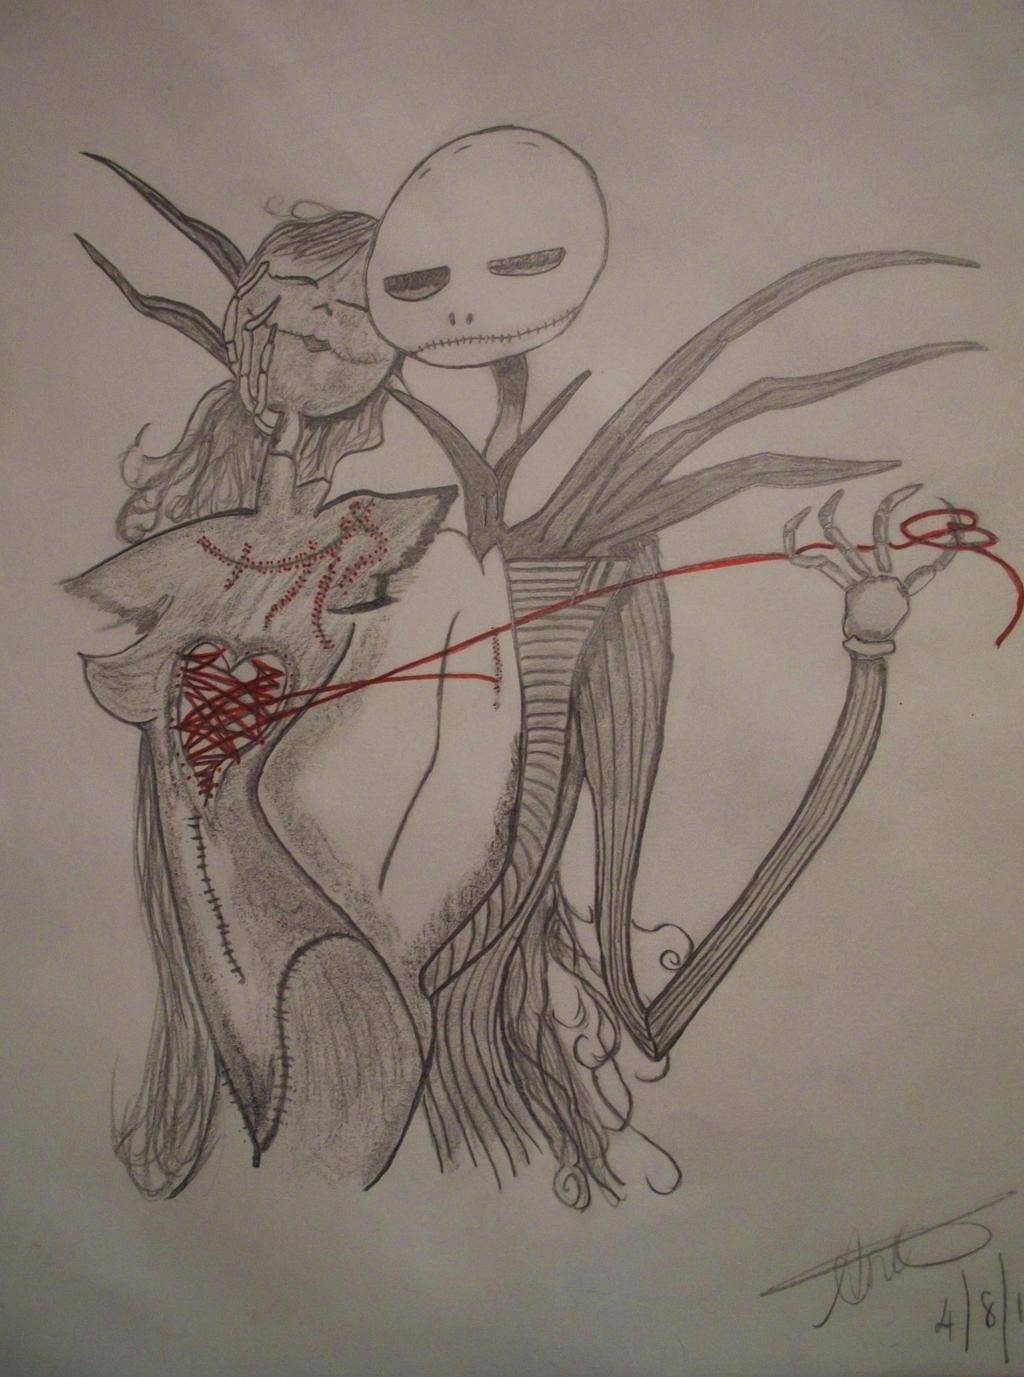 Sew up my broken heart by turbotongue on DeviantArt Pencil Drawings Of Broken Hearts